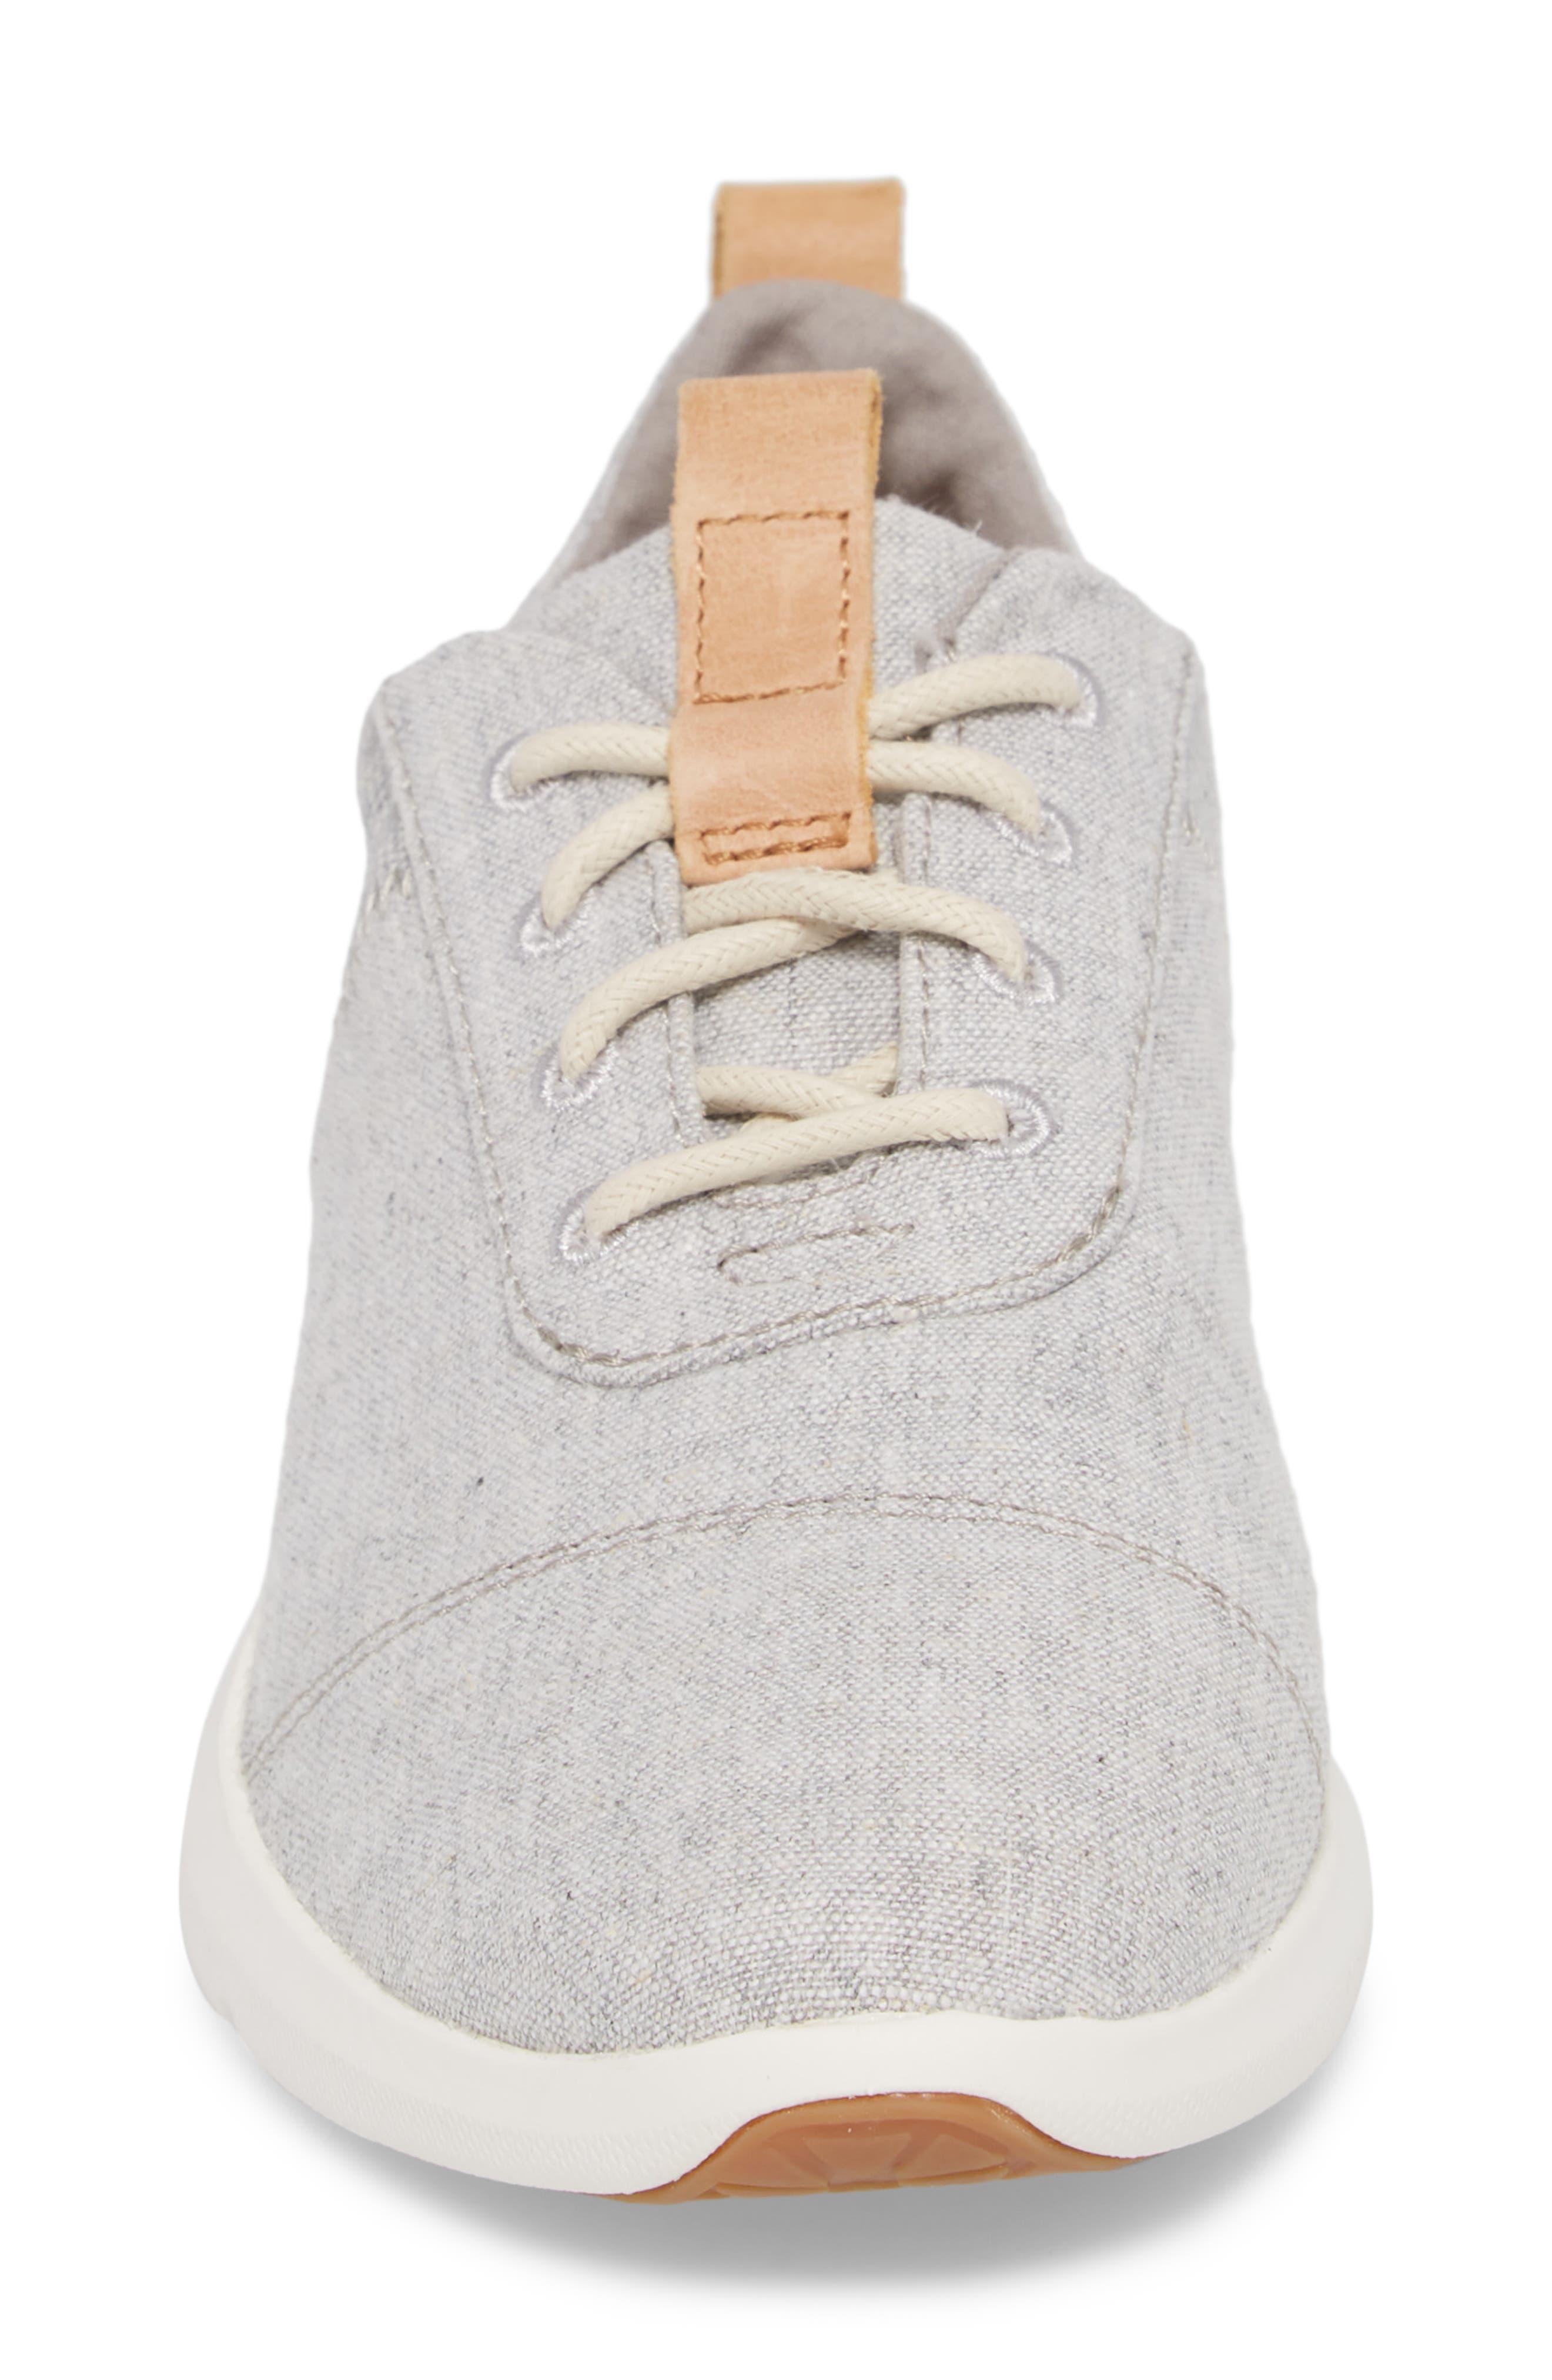 Cabrillo Sneaker,                             Alternate thumbnail 4, color,                             DRIZZLE GREY CHAMBRAY MIX